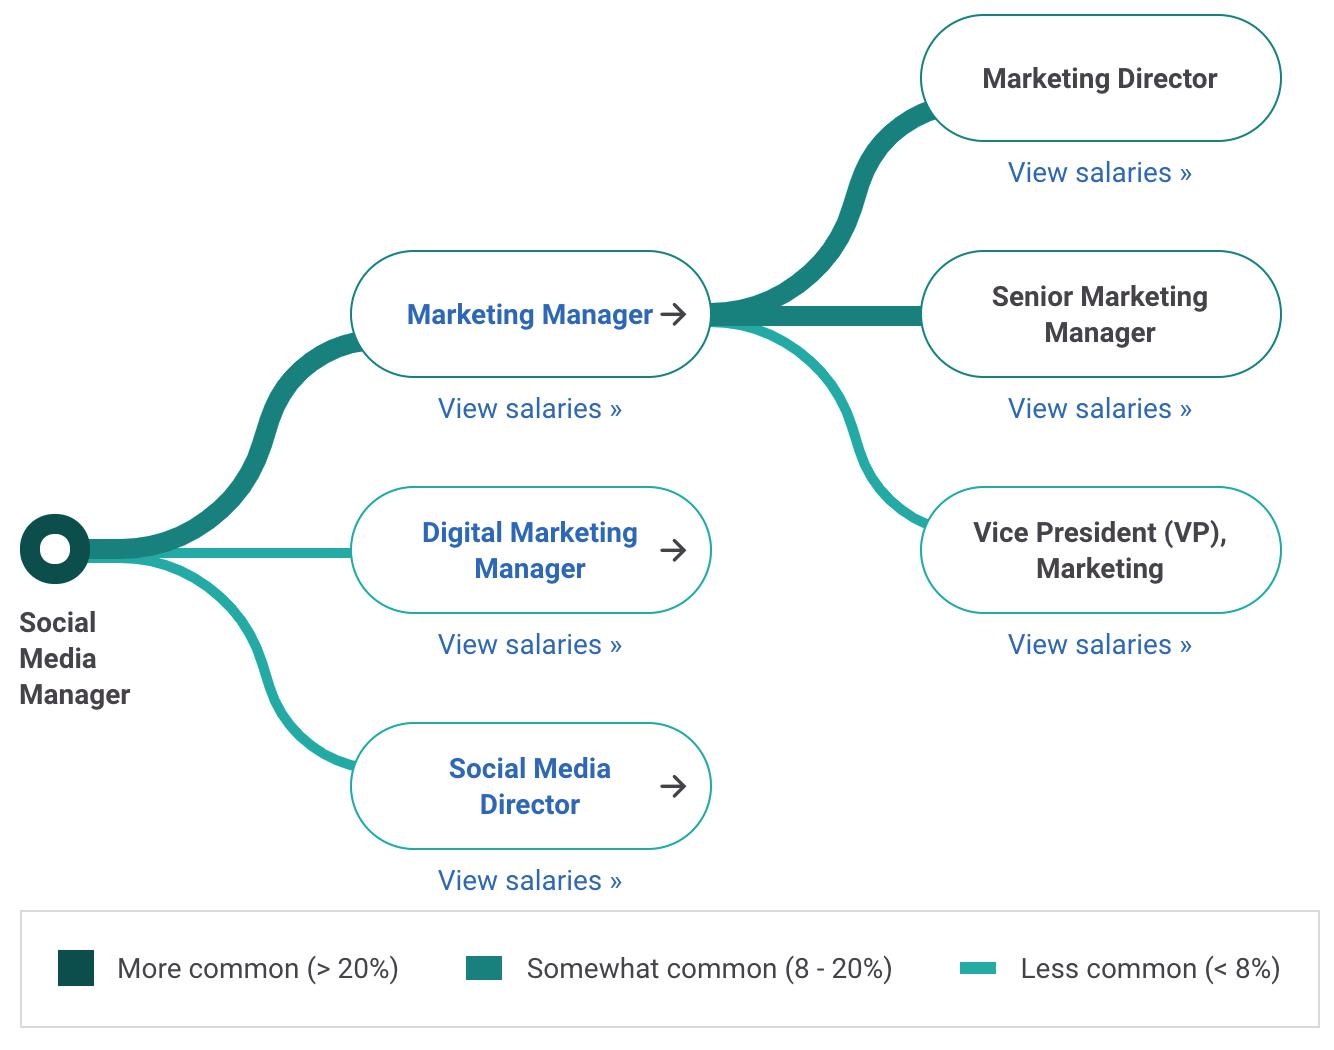 Social Media Manager Career Path